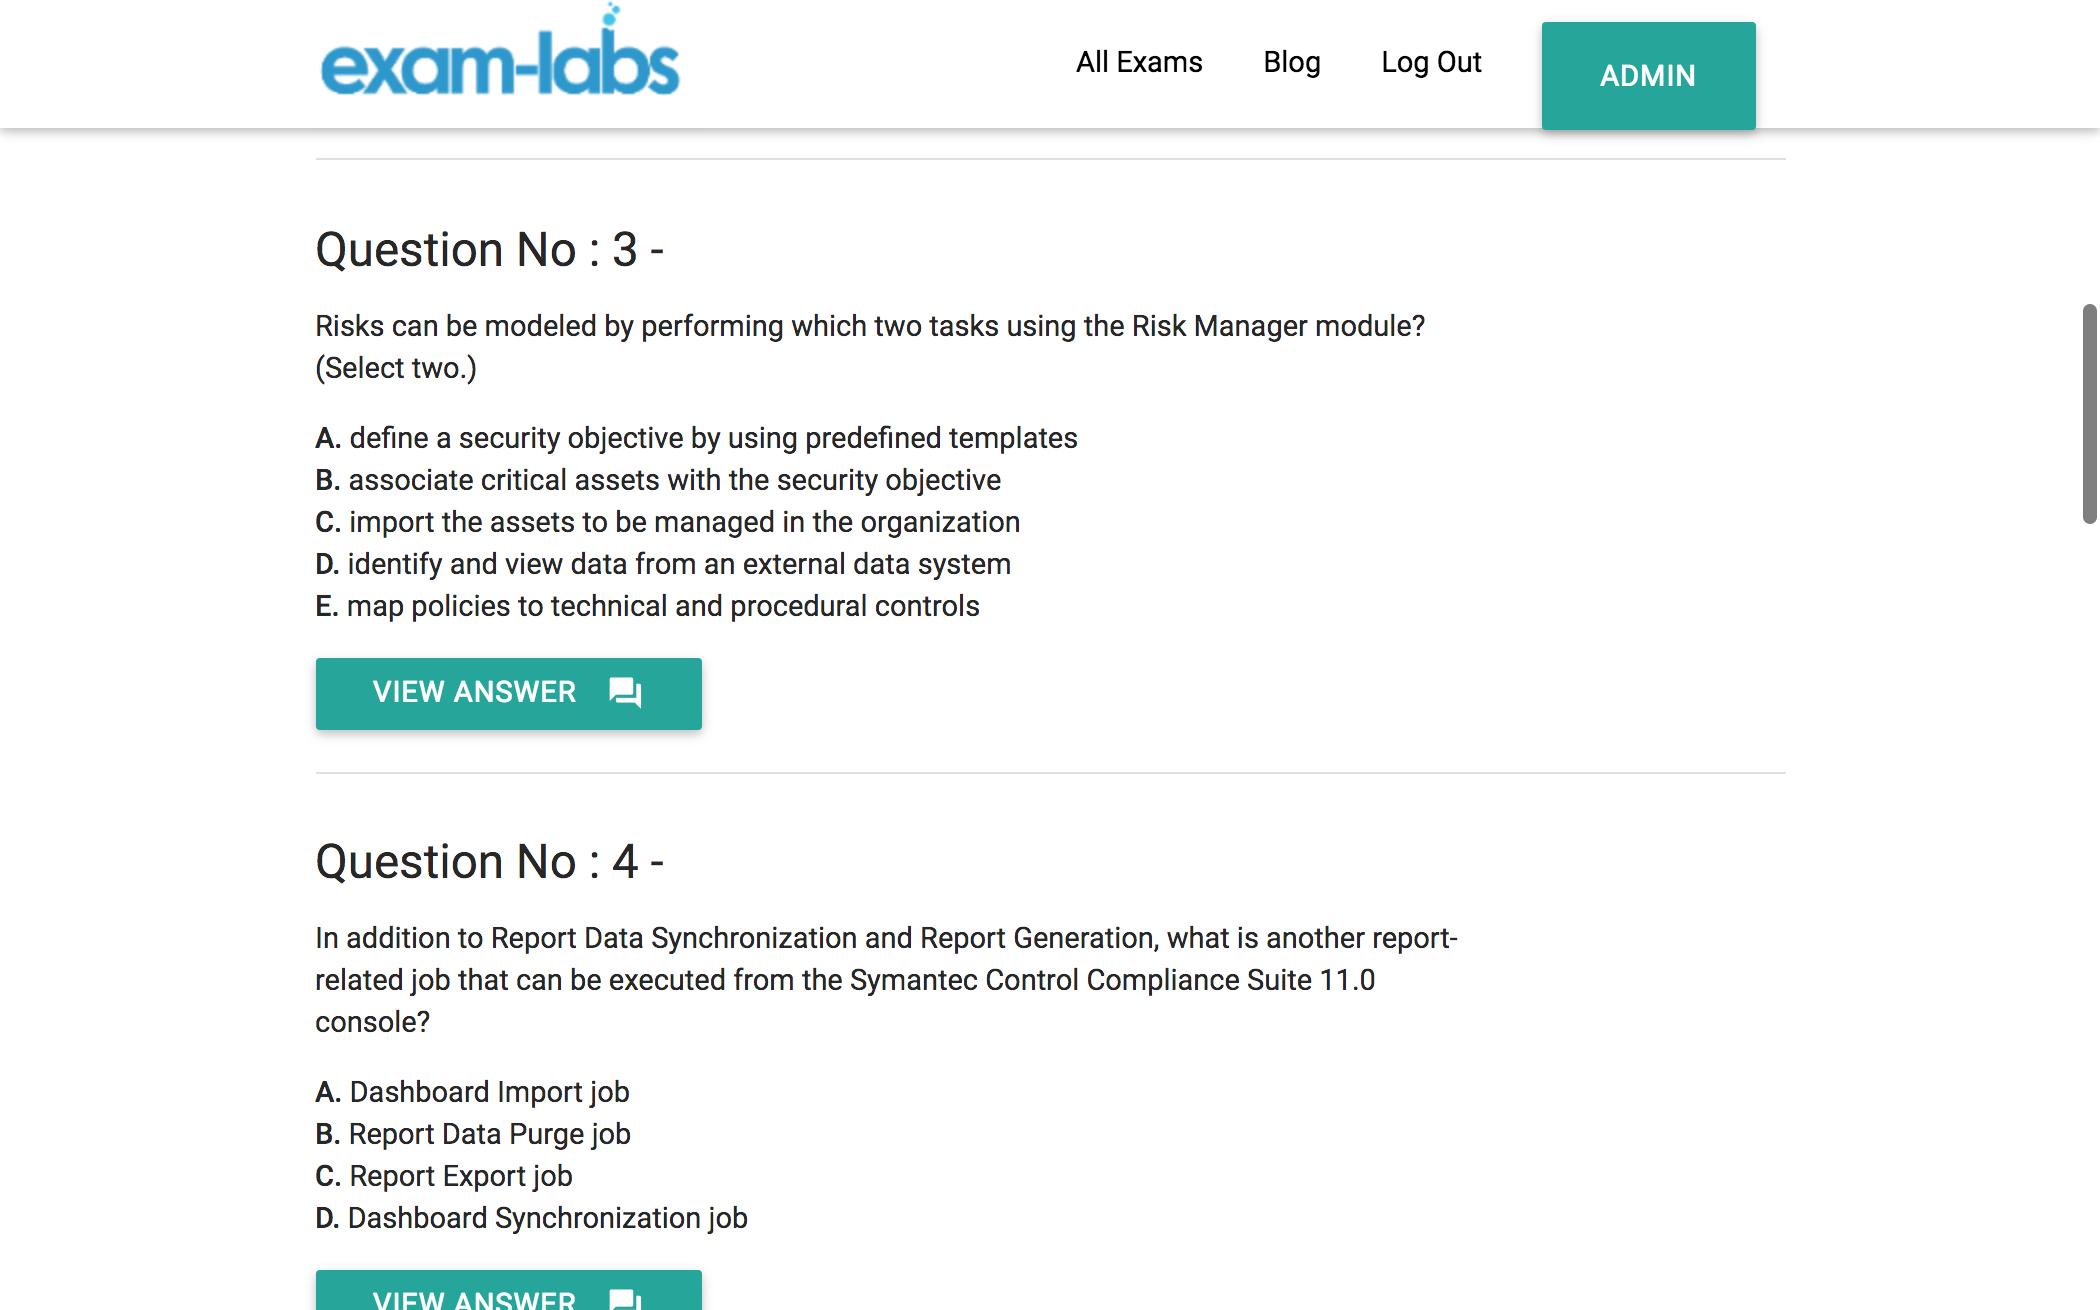 ST0-151 - Symantec Practice Exam Questions - 100% Free   Exam-Labs